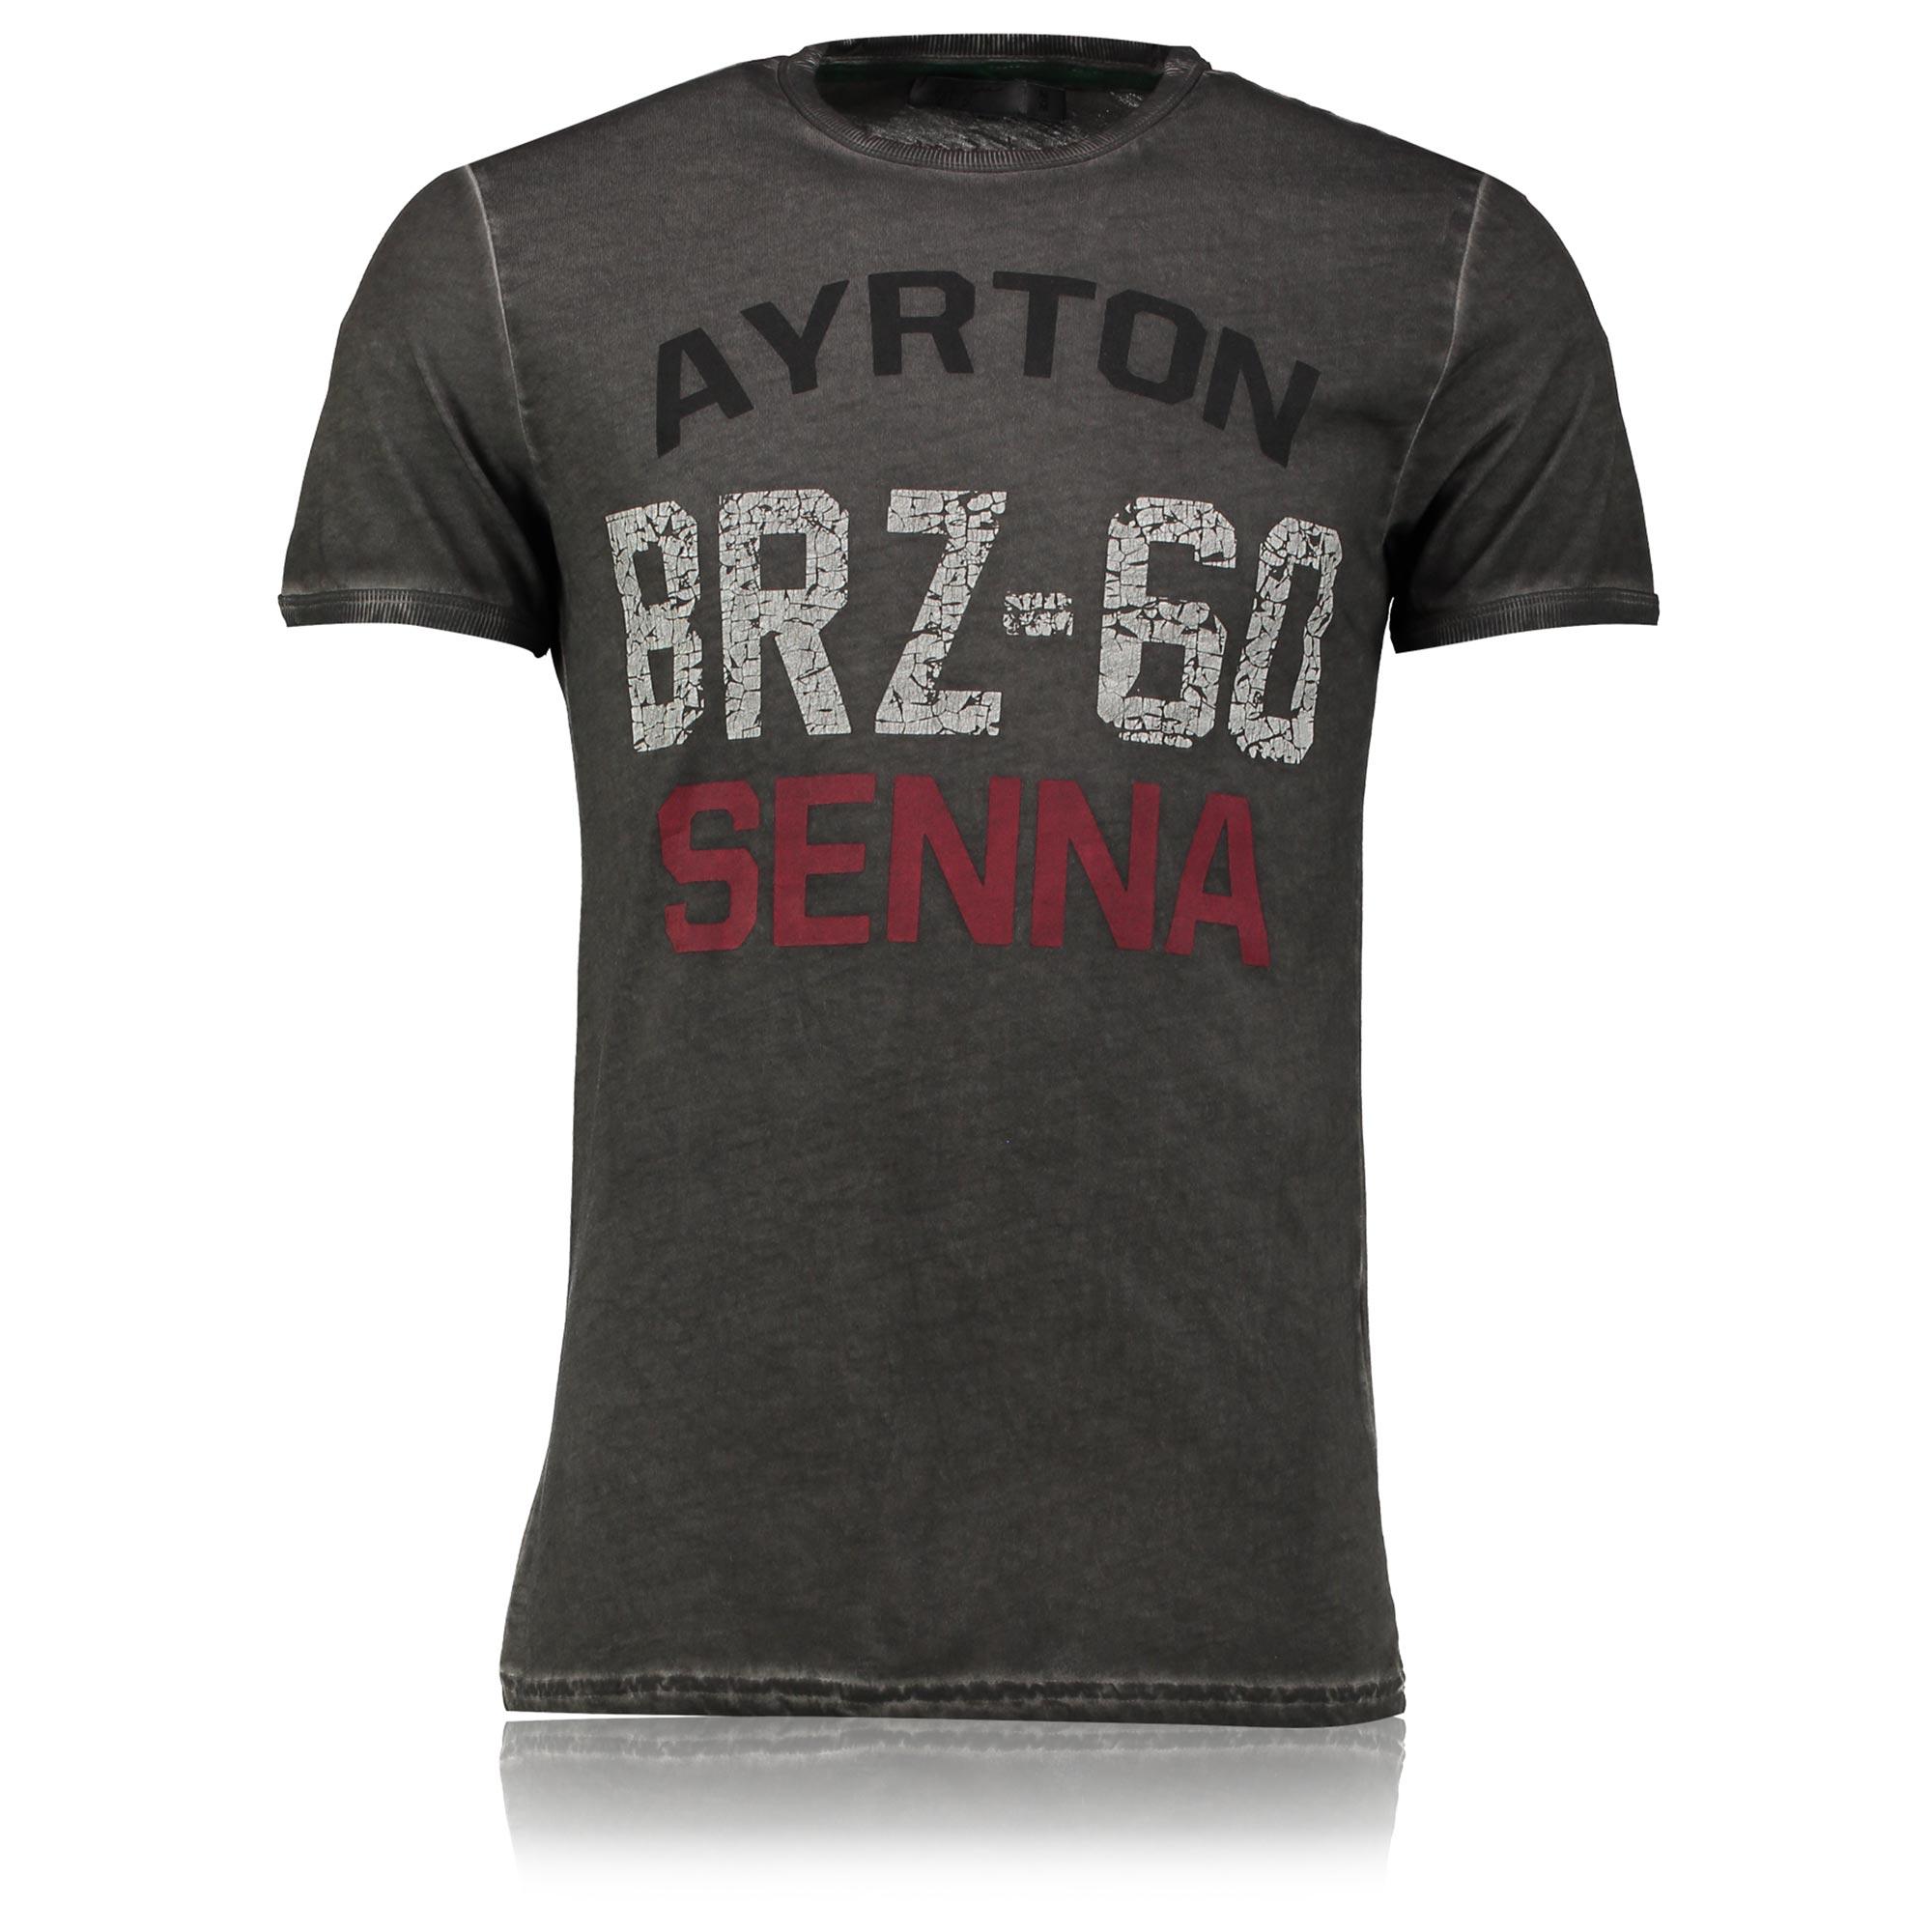 Image of Ayrton Senna BRZ-60 T-Shirt